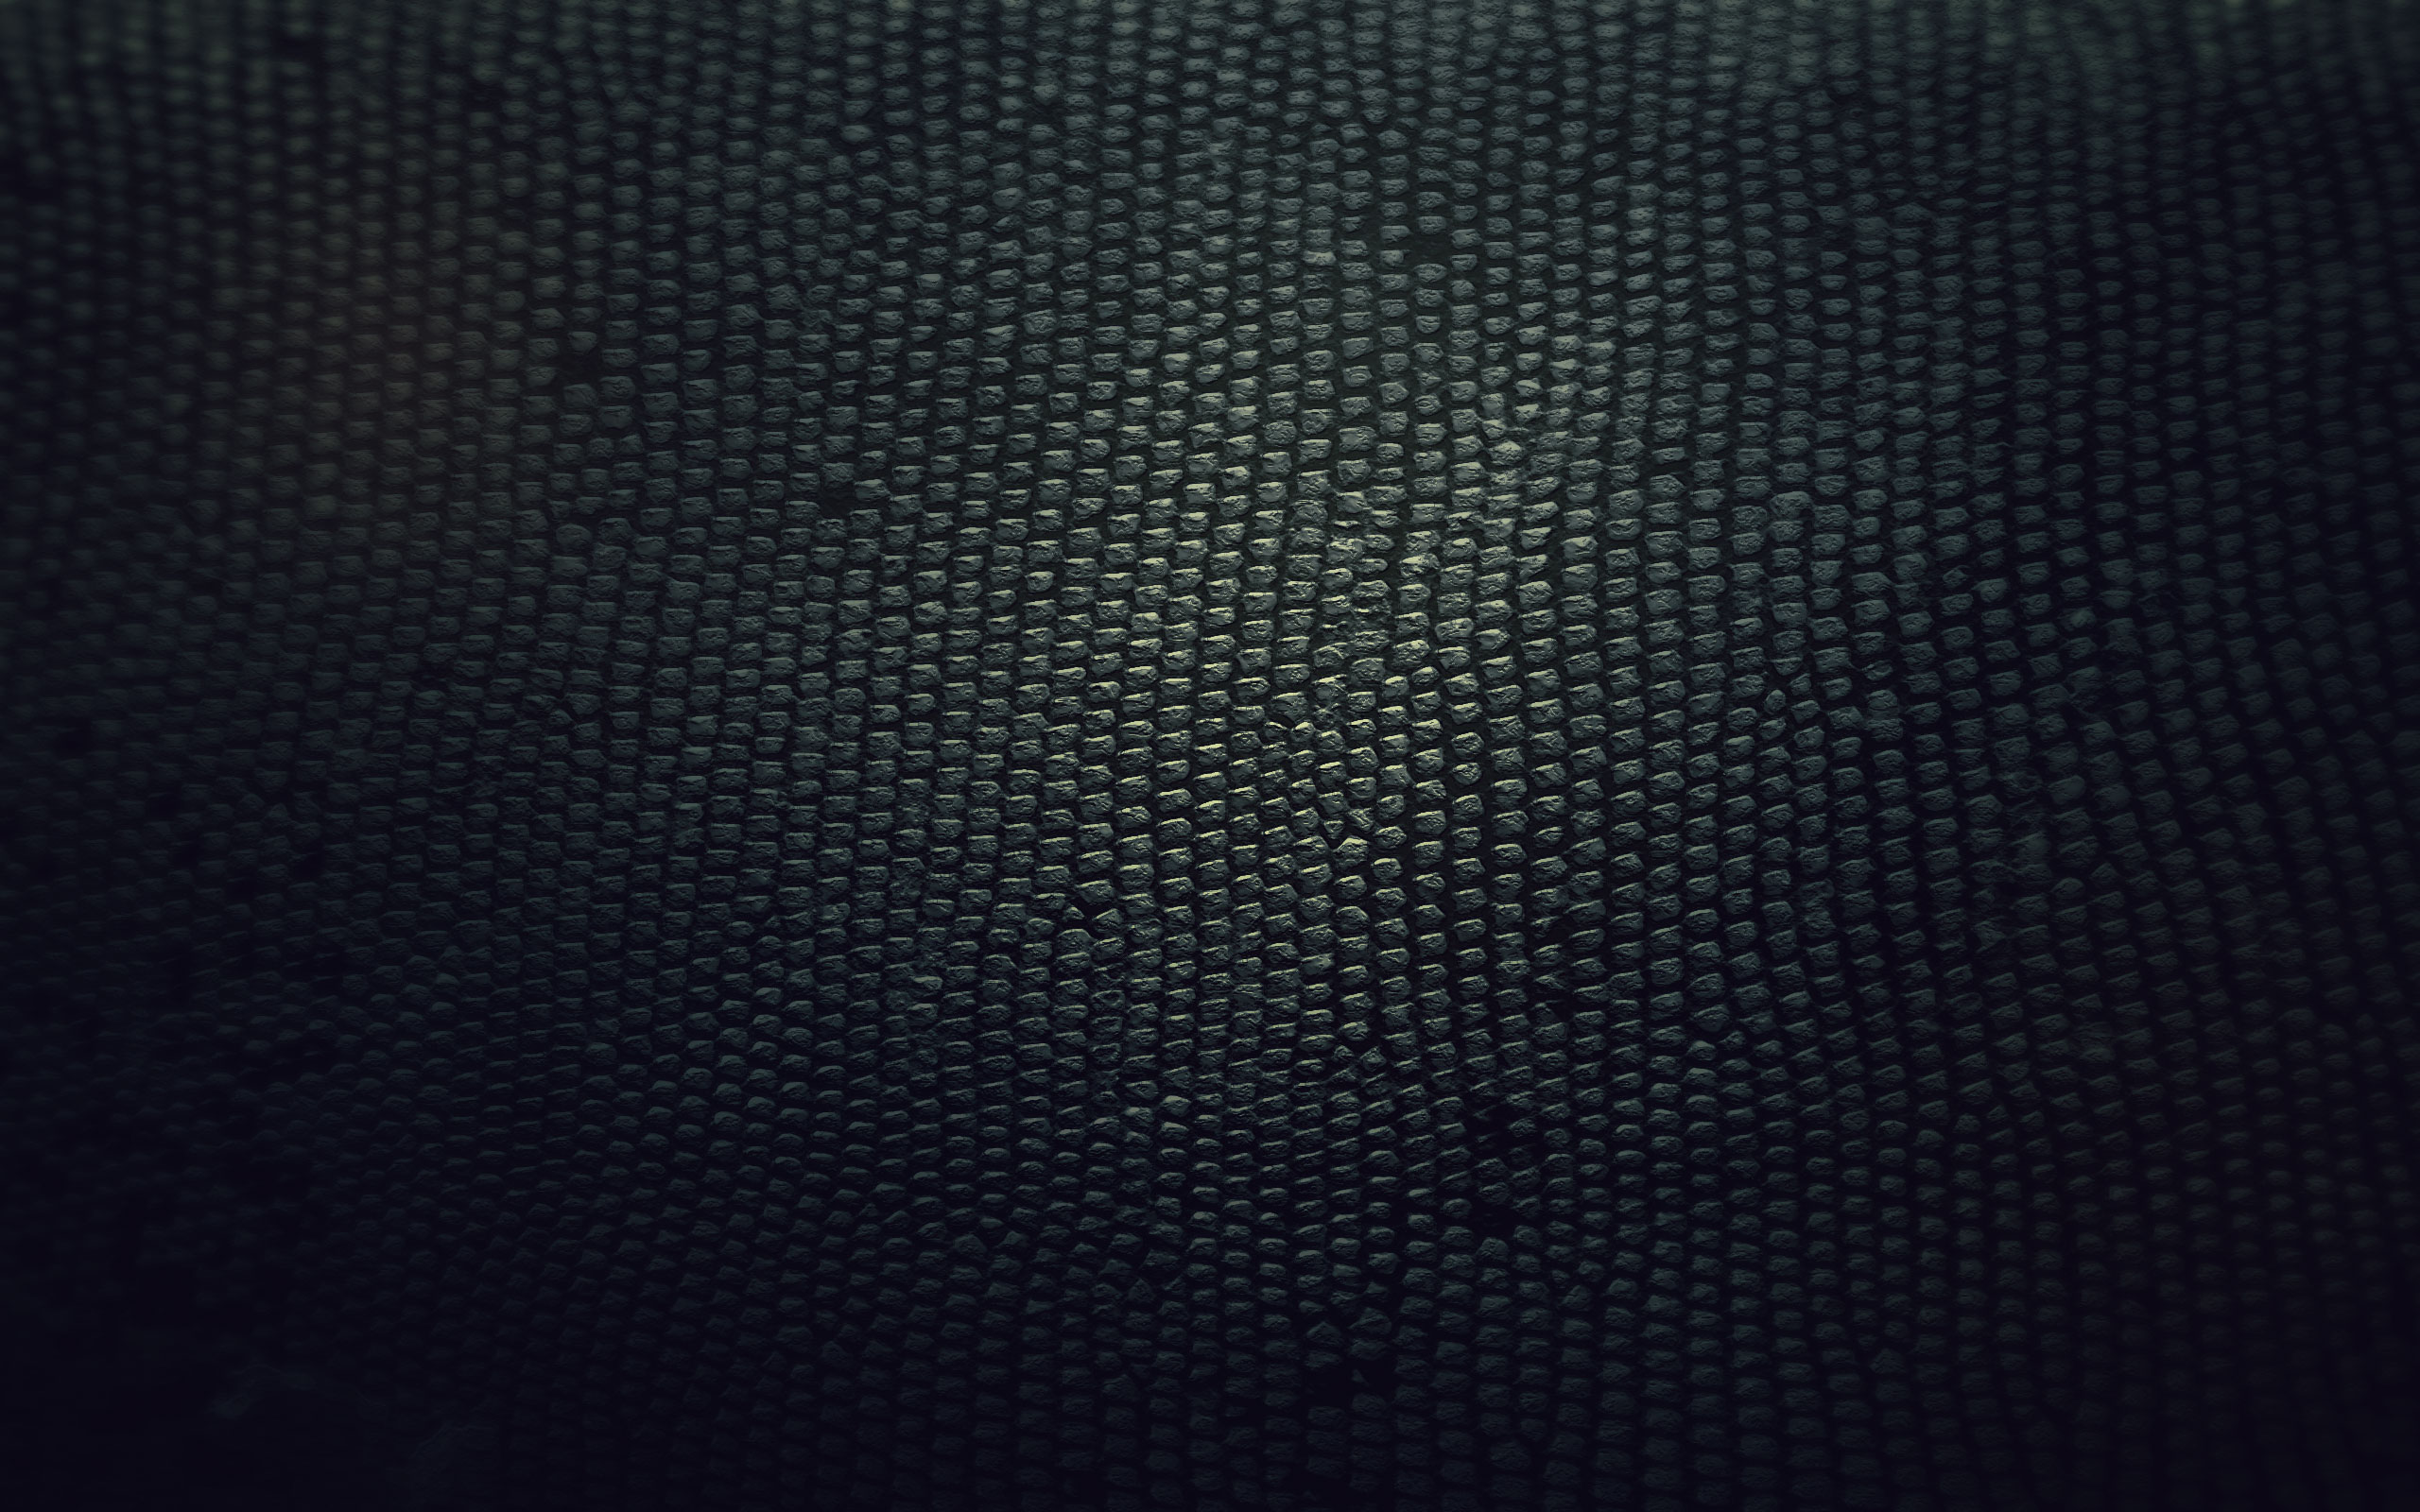 Текстурные обои на андроид